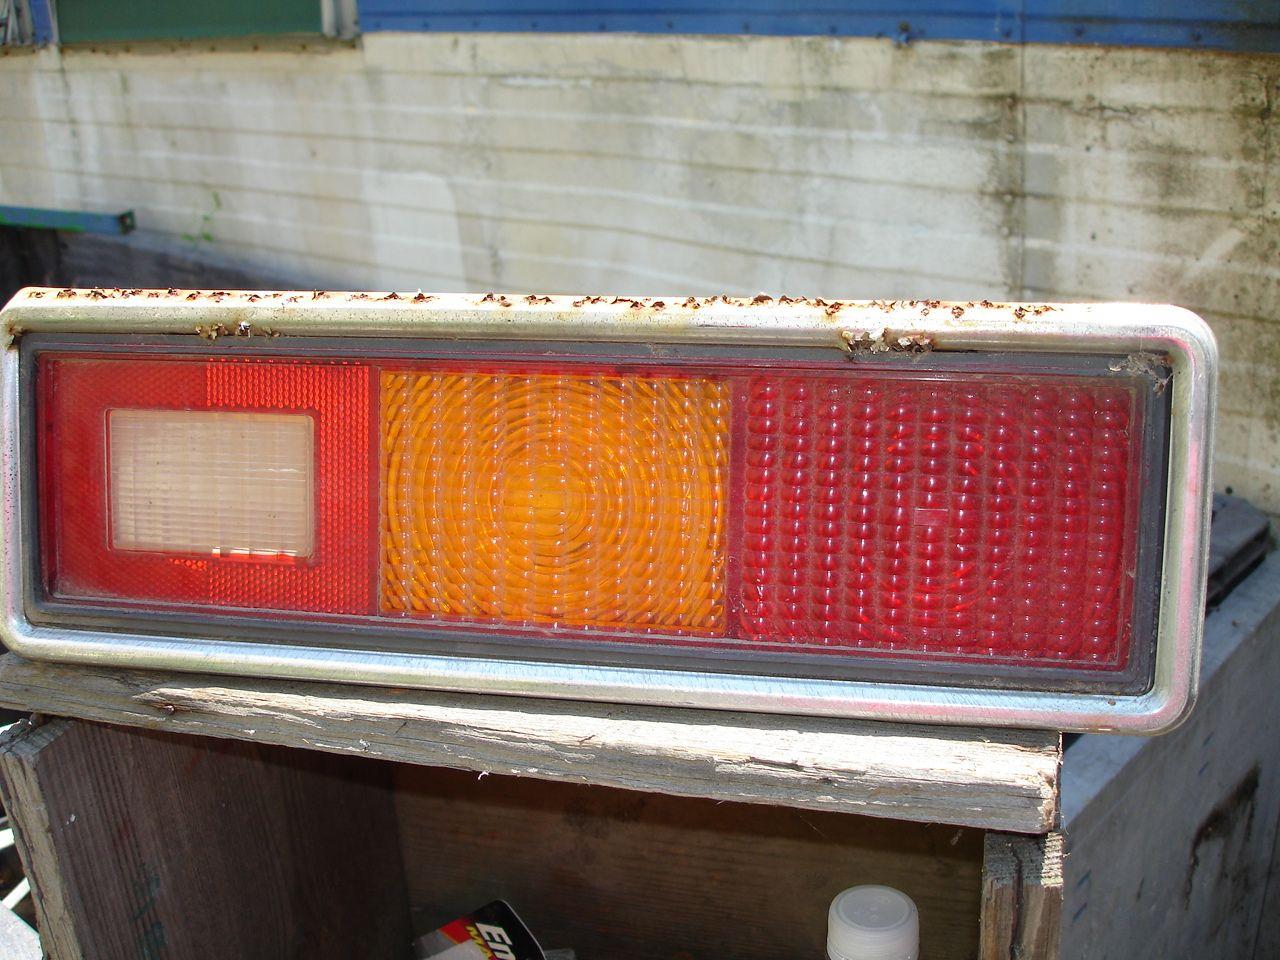 1976 1979 Chevrolet Chevette Acadian Rr Taillight Wiring Diagram